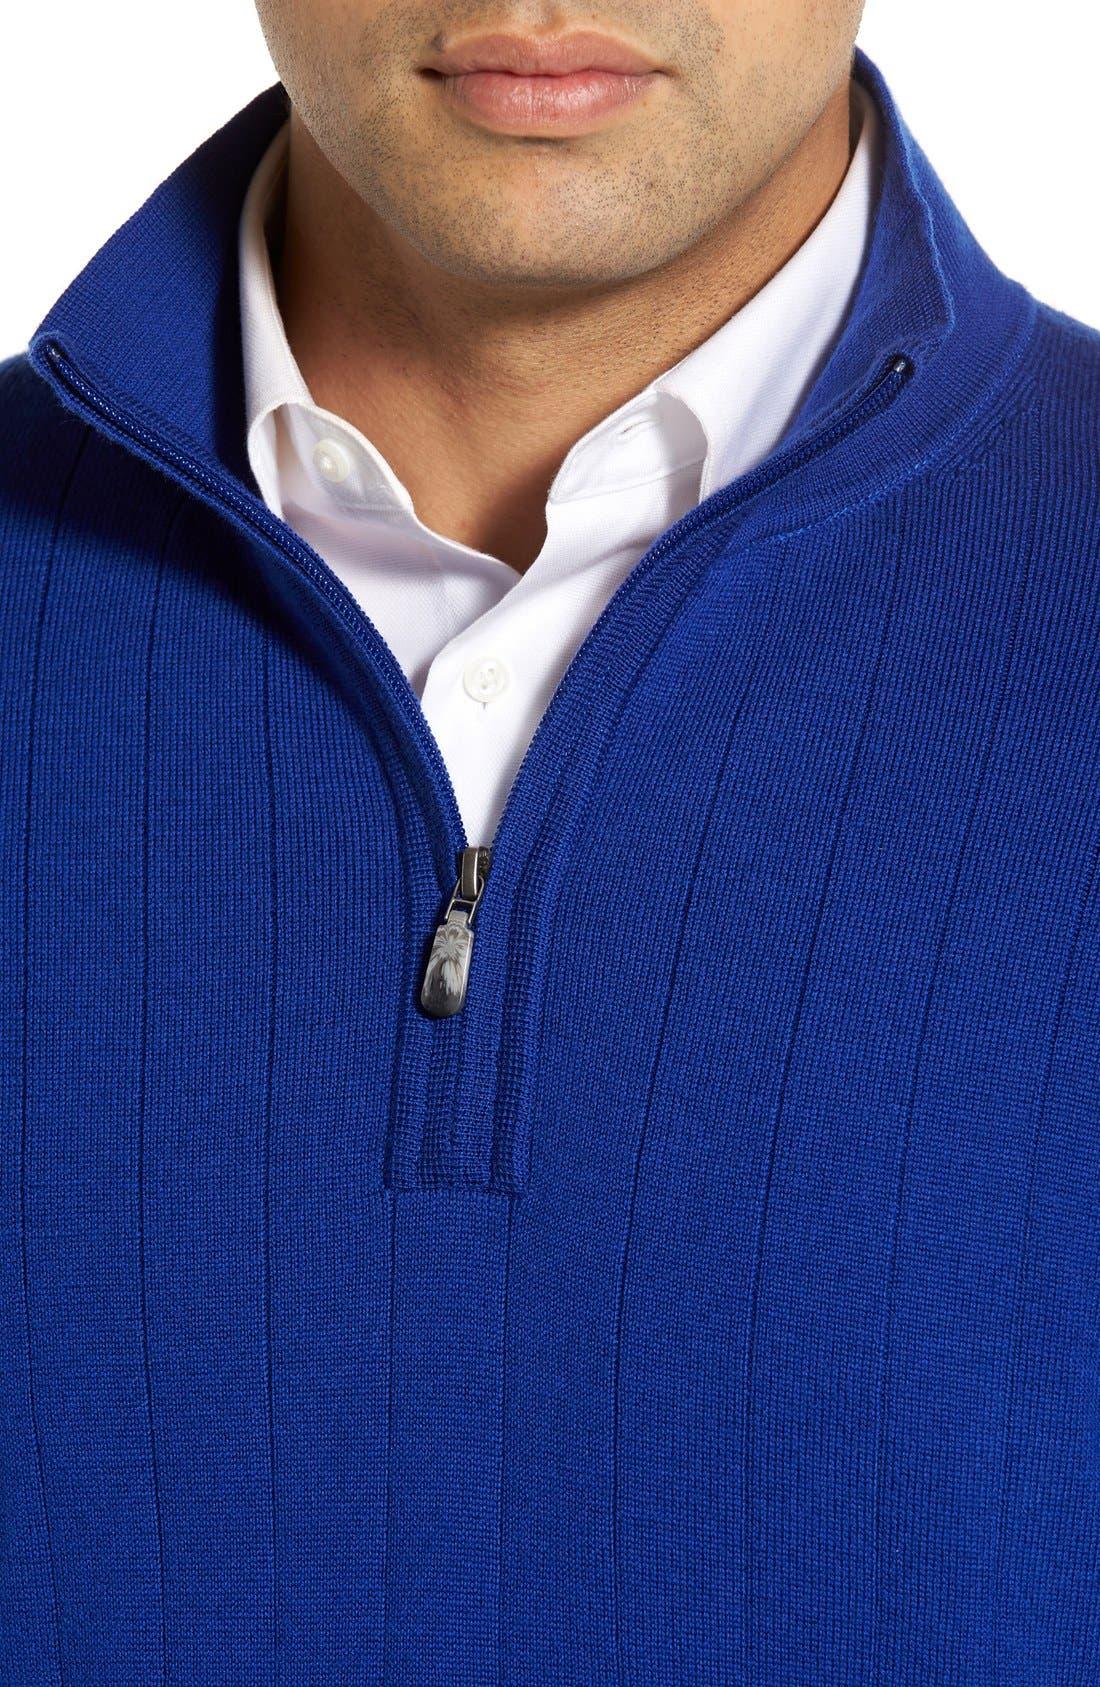 Windproof Merino Wool Quarter Zip Sweater,                             Alternate thumbnail 4, color,                             401